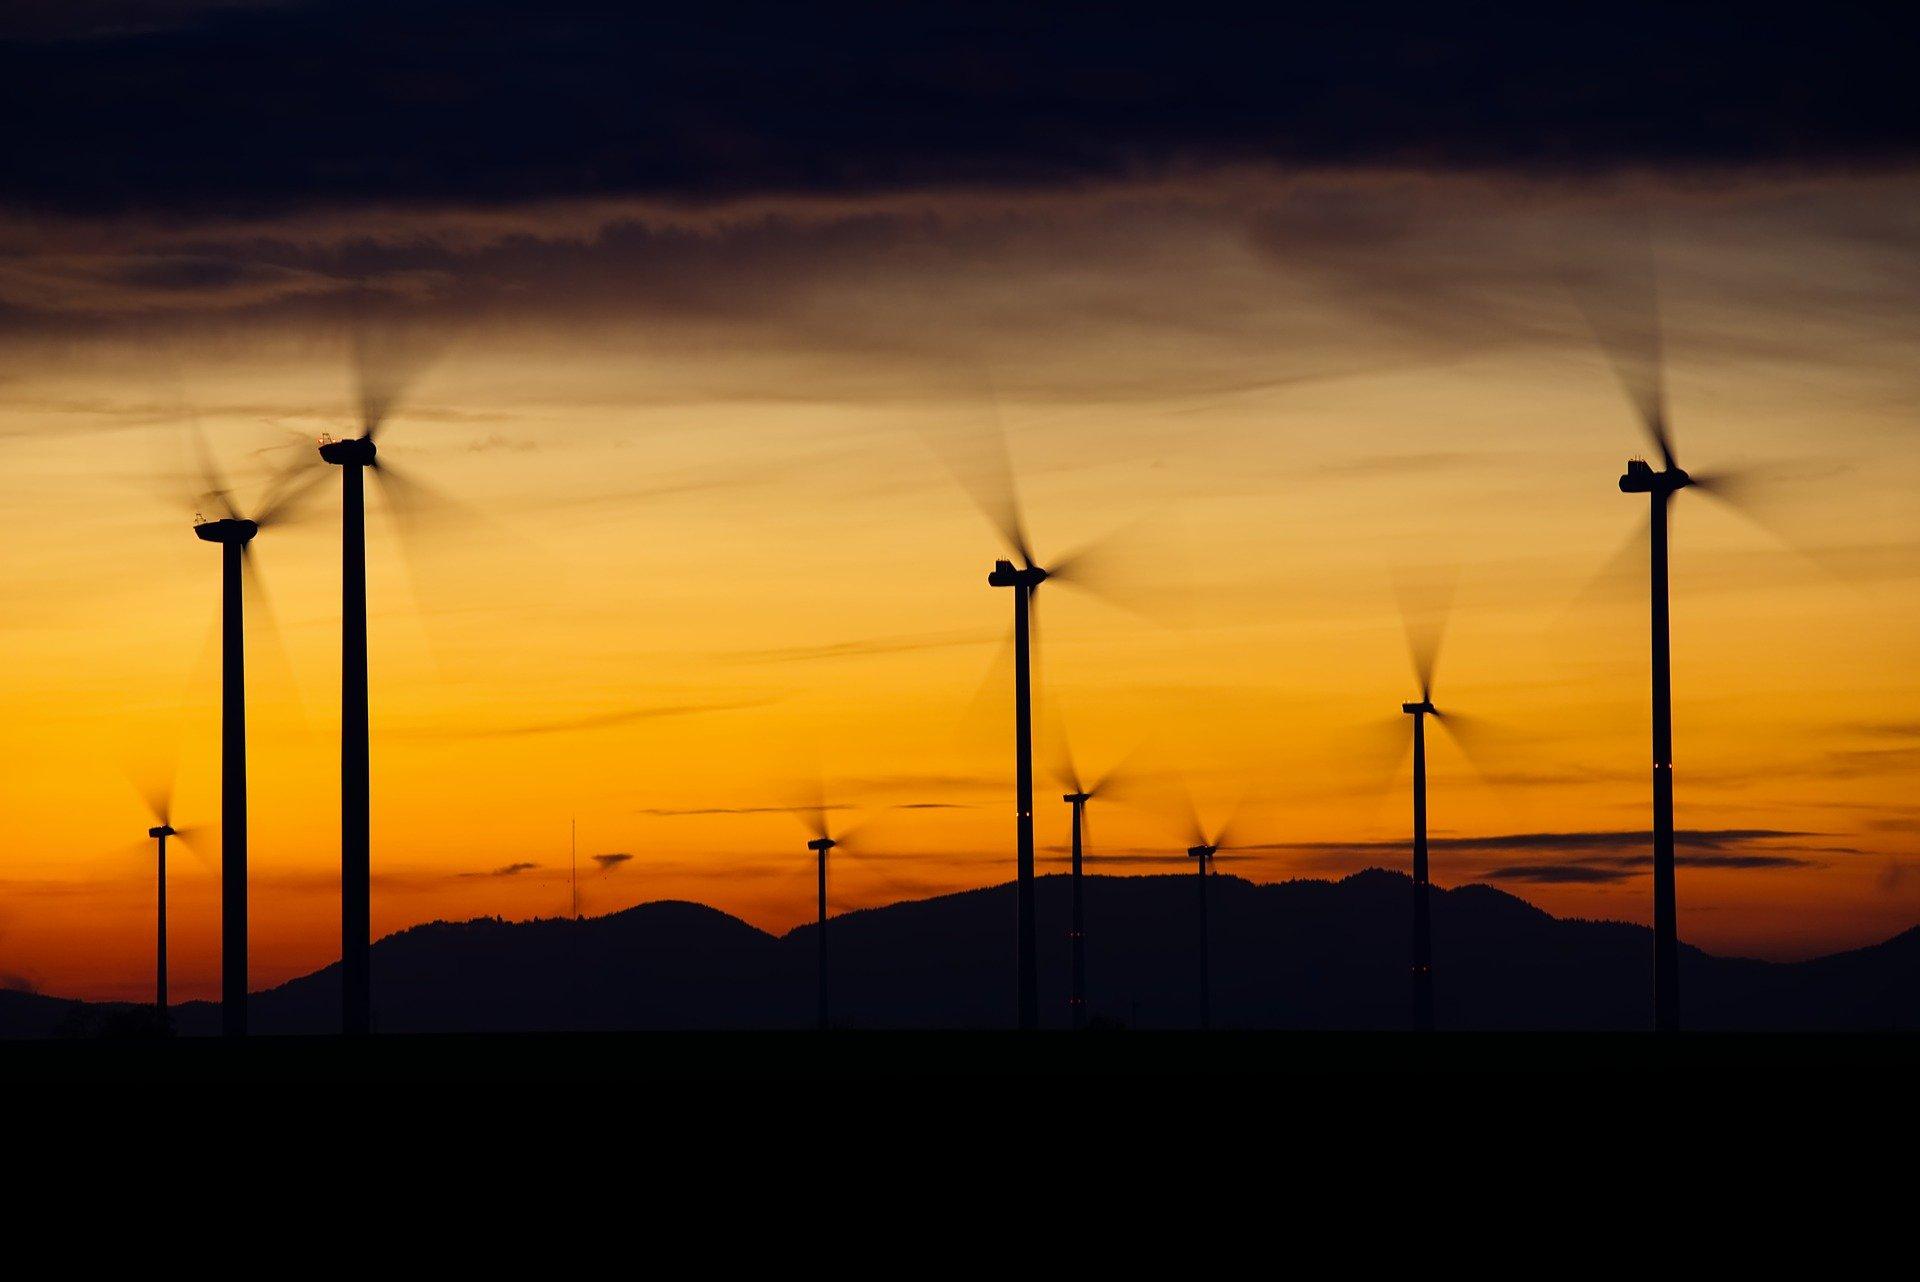 https://riftalliance.com/wp-content/uploads/2021/07/wind-turbines-2991696_1920.jpg